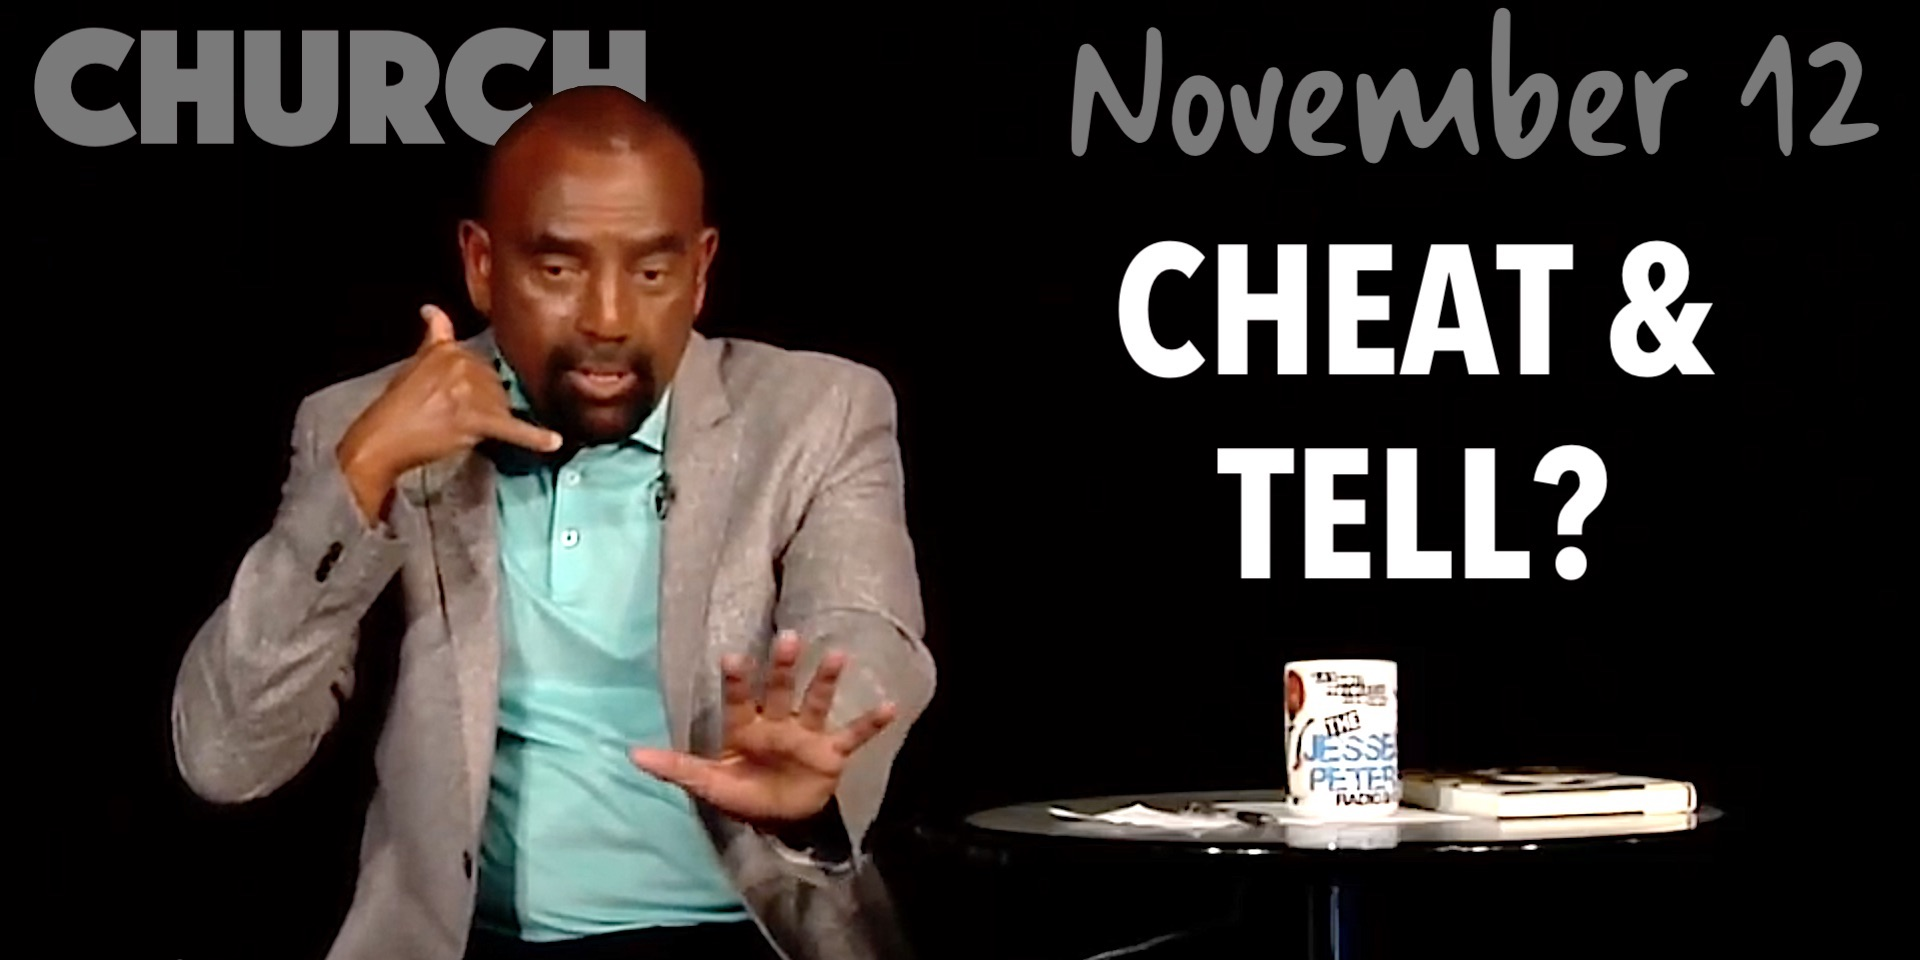 If a Man Cheats, Should He Tell His Wife? (Church Nov 12, 2019)